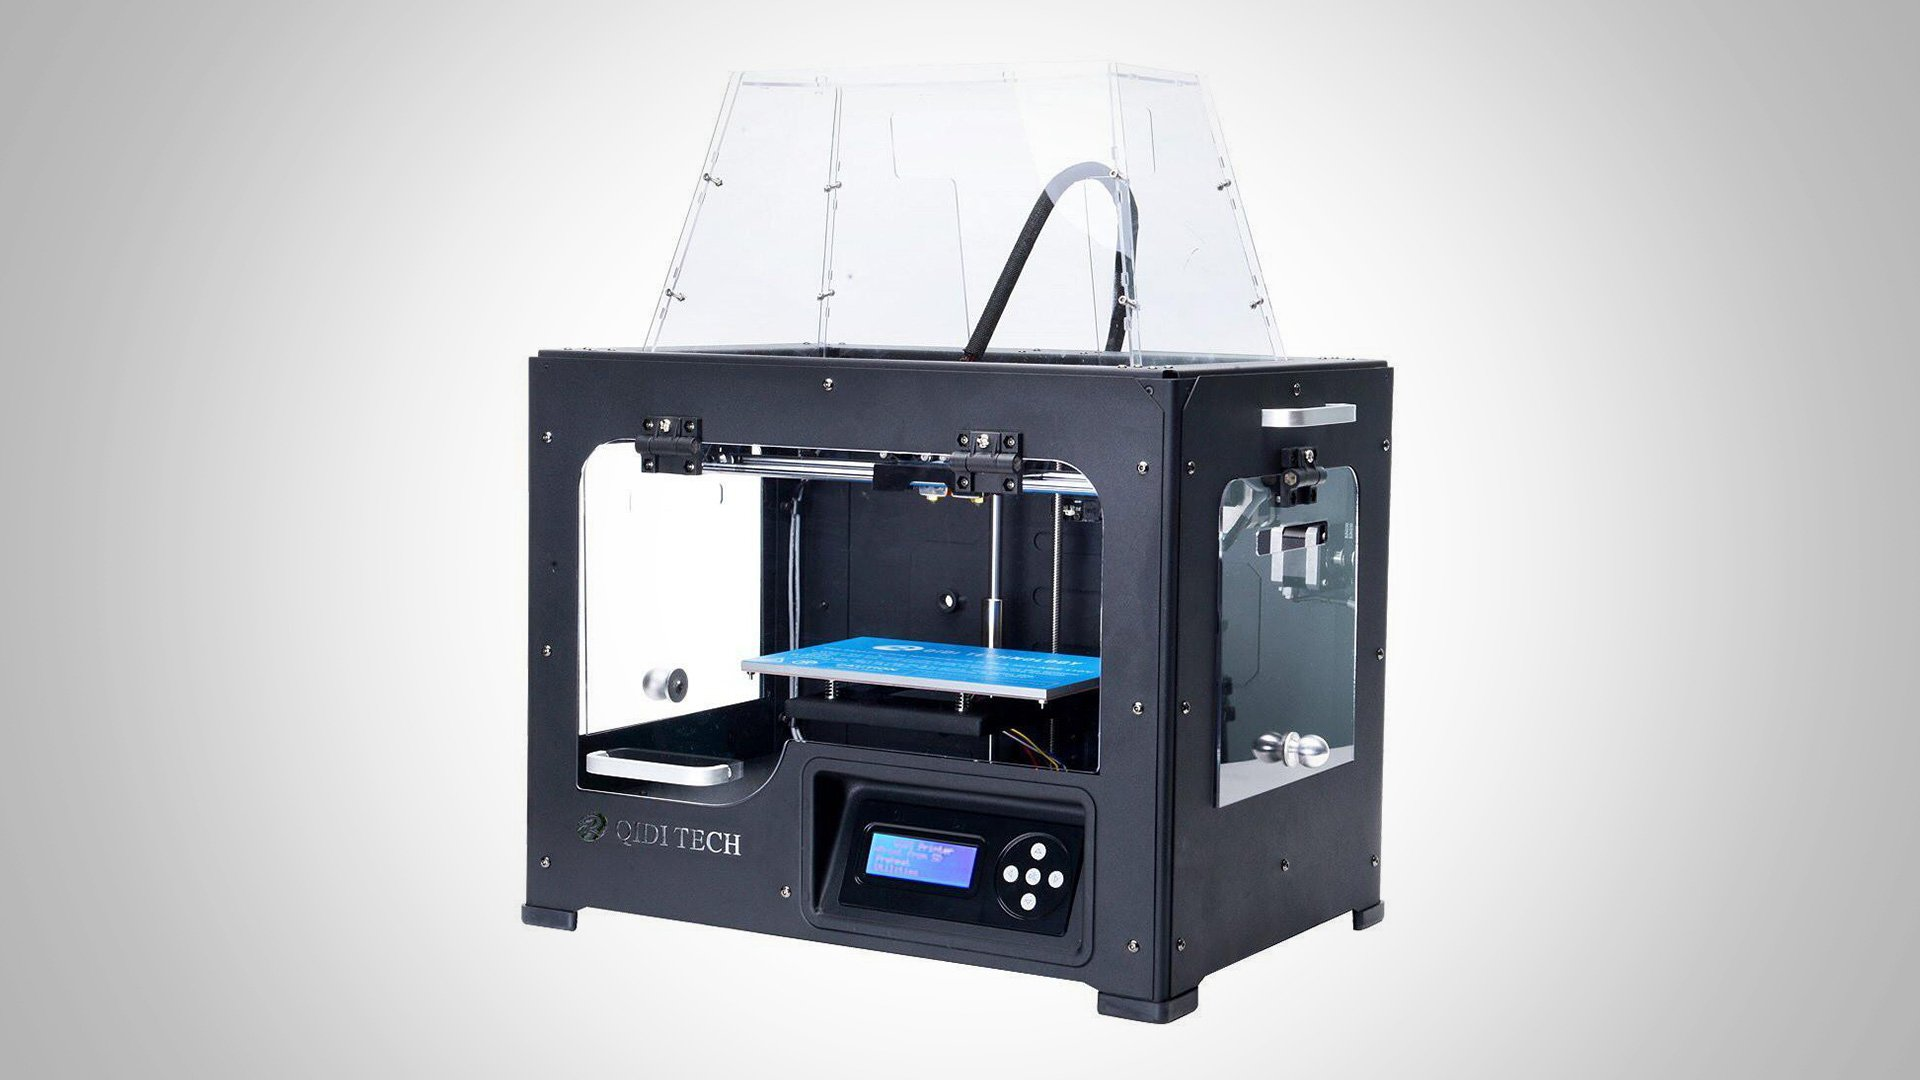 [DEAL] Qidi Tech 1 Dual Extrusion 3D Printer, 13% Off at $610 | All3DP